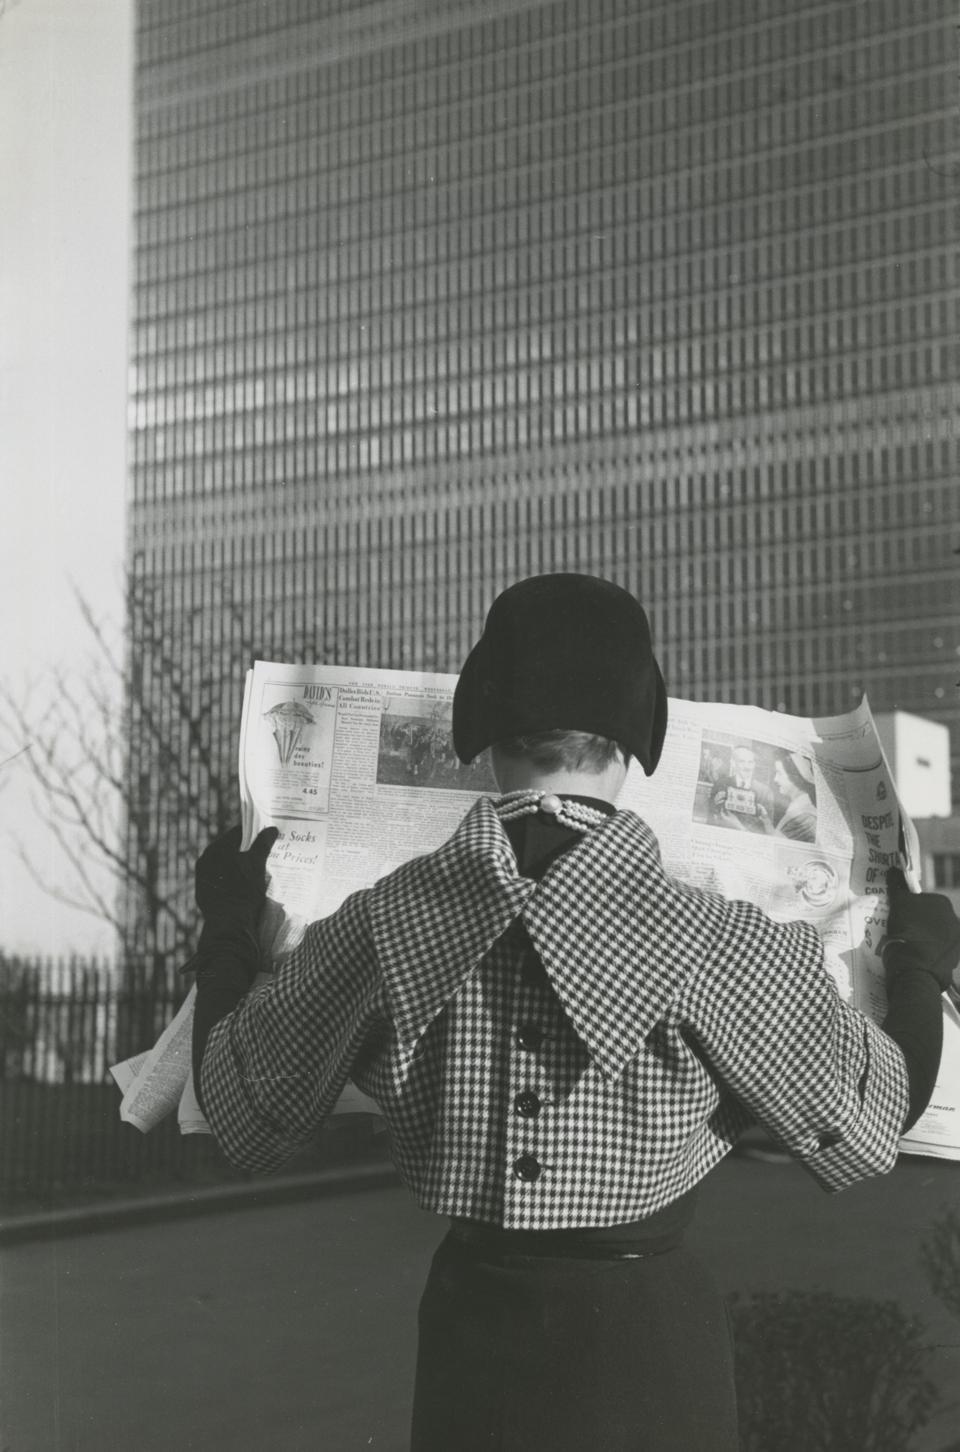 Erwin Blumenfeld. Kathleen Blumenfeld (a test shot), New York, c. 1956. Gelatin silver print. Private collection. © Estate of Erwin Blumenfeld; image provided by Galerie Sophie Scheidecker, Paris